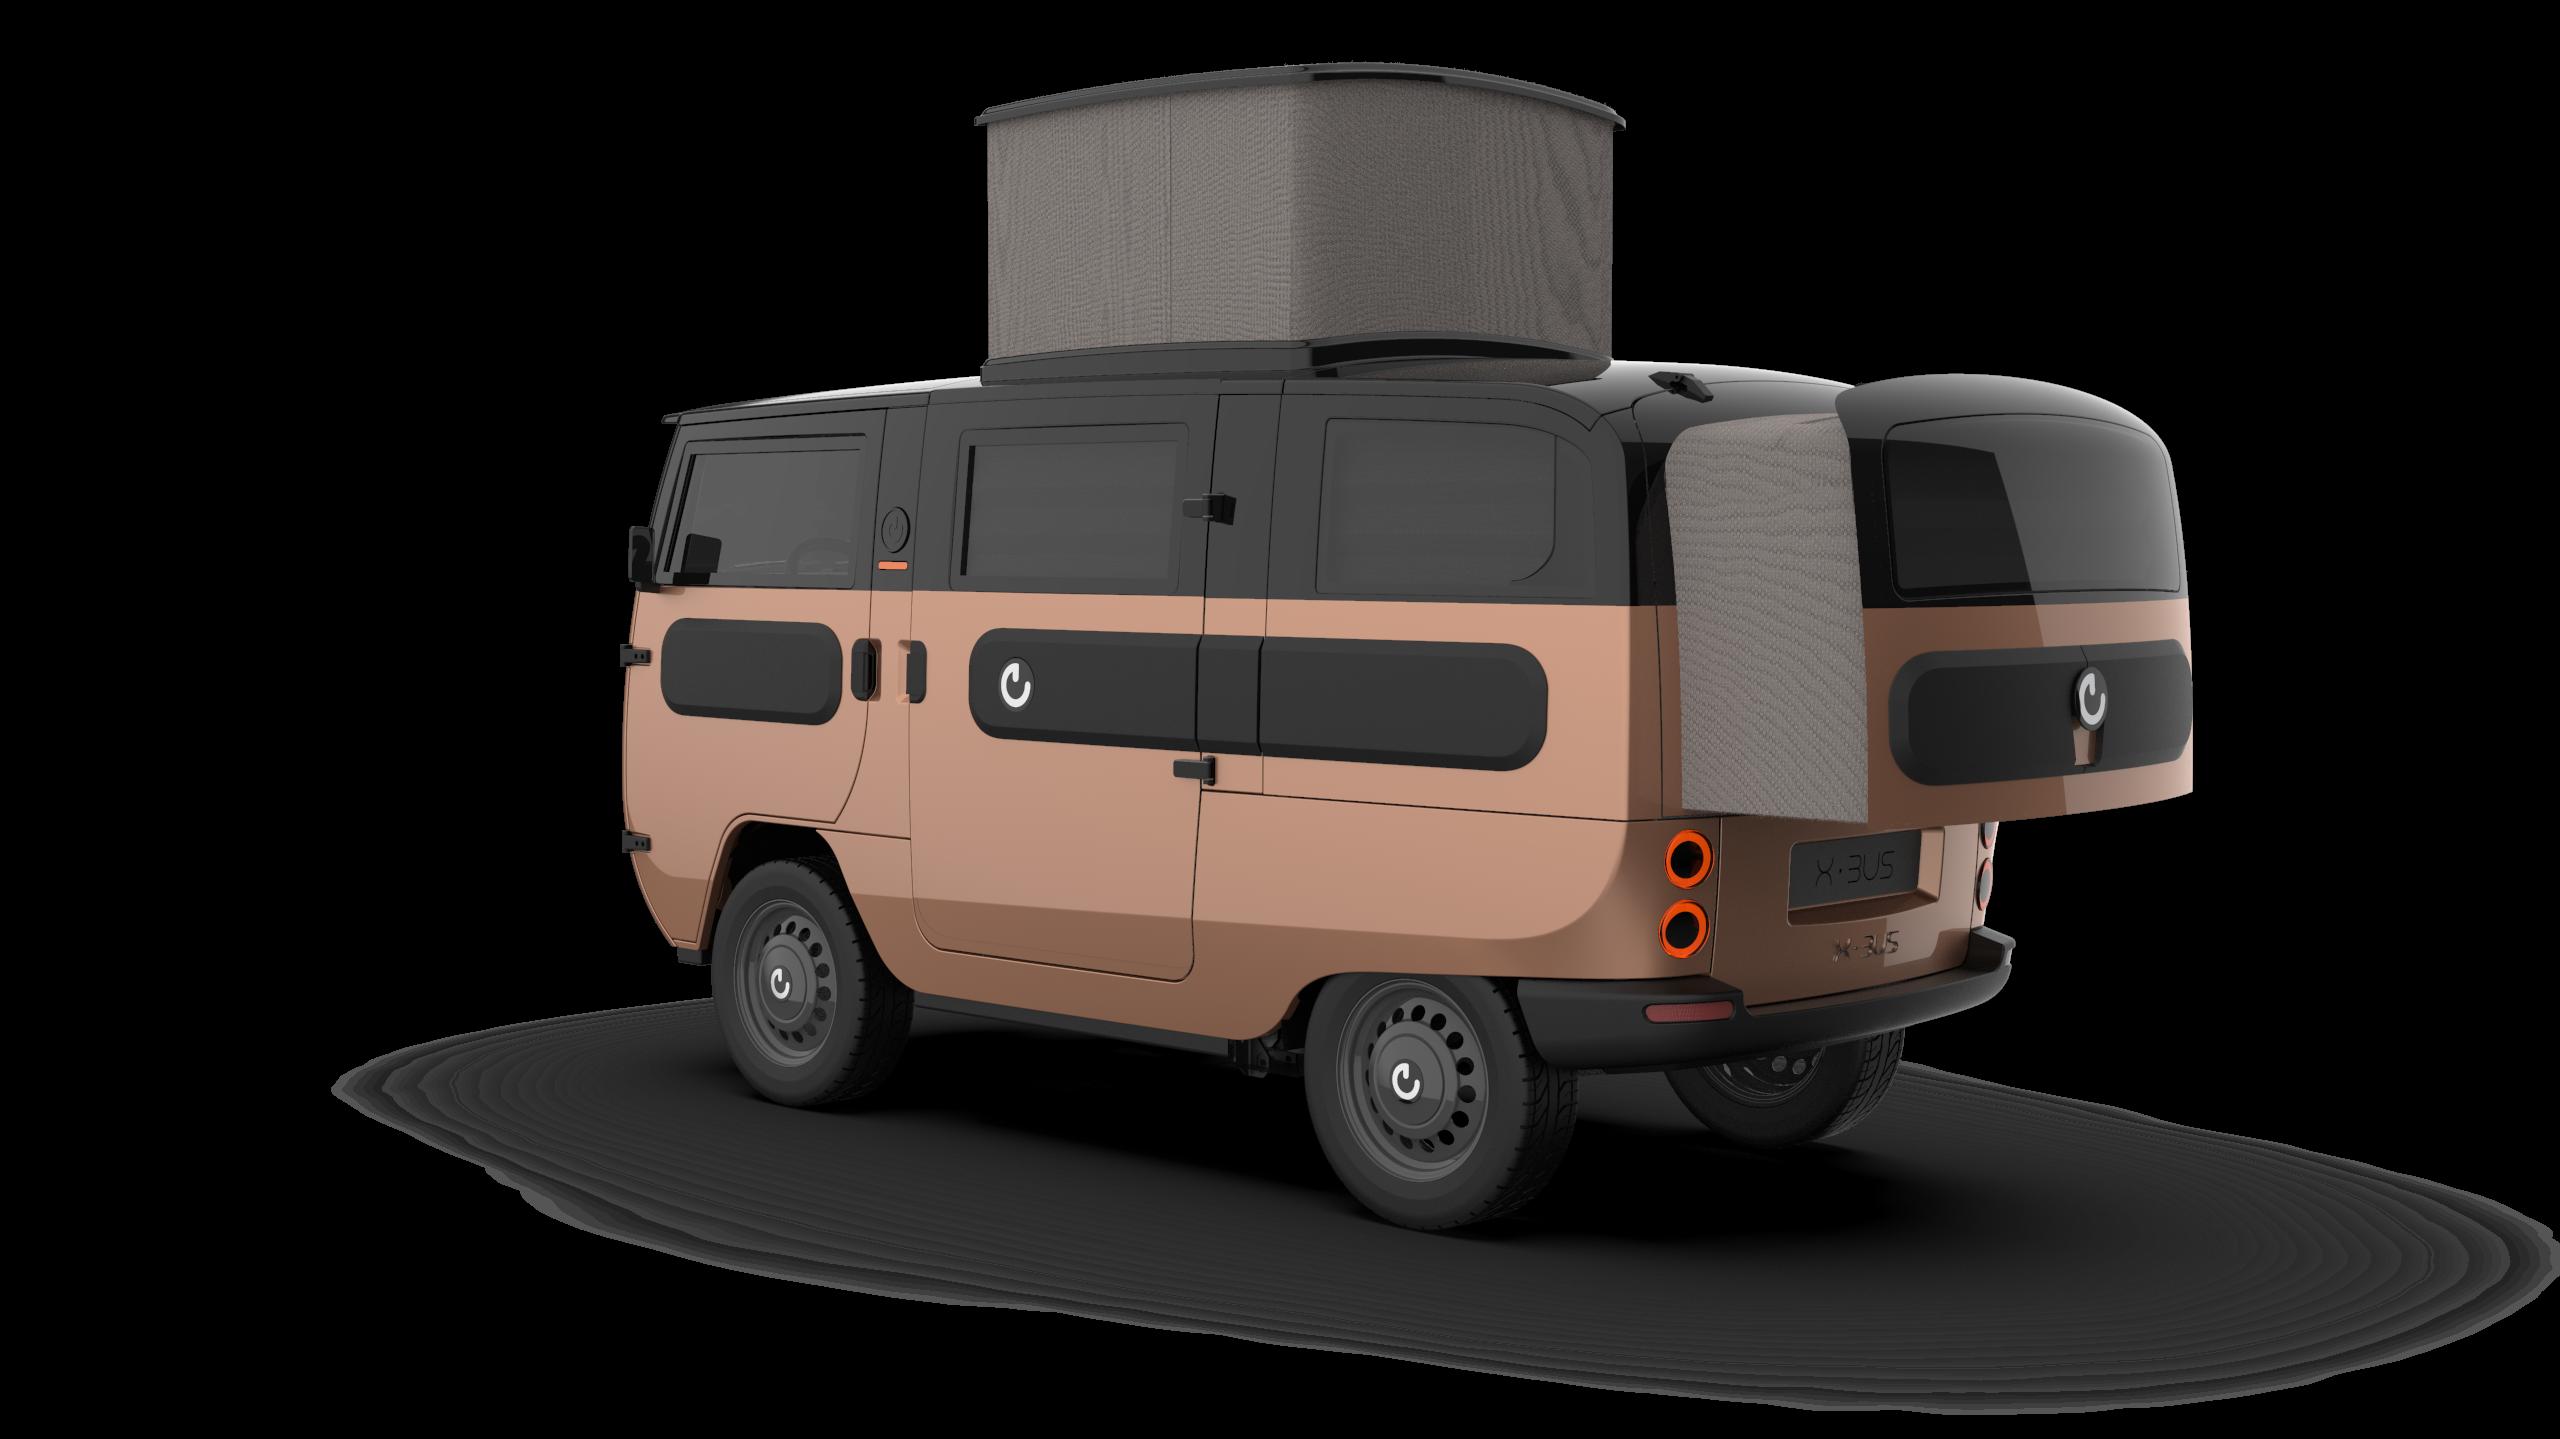 XBUS_Standard_Camper_rear